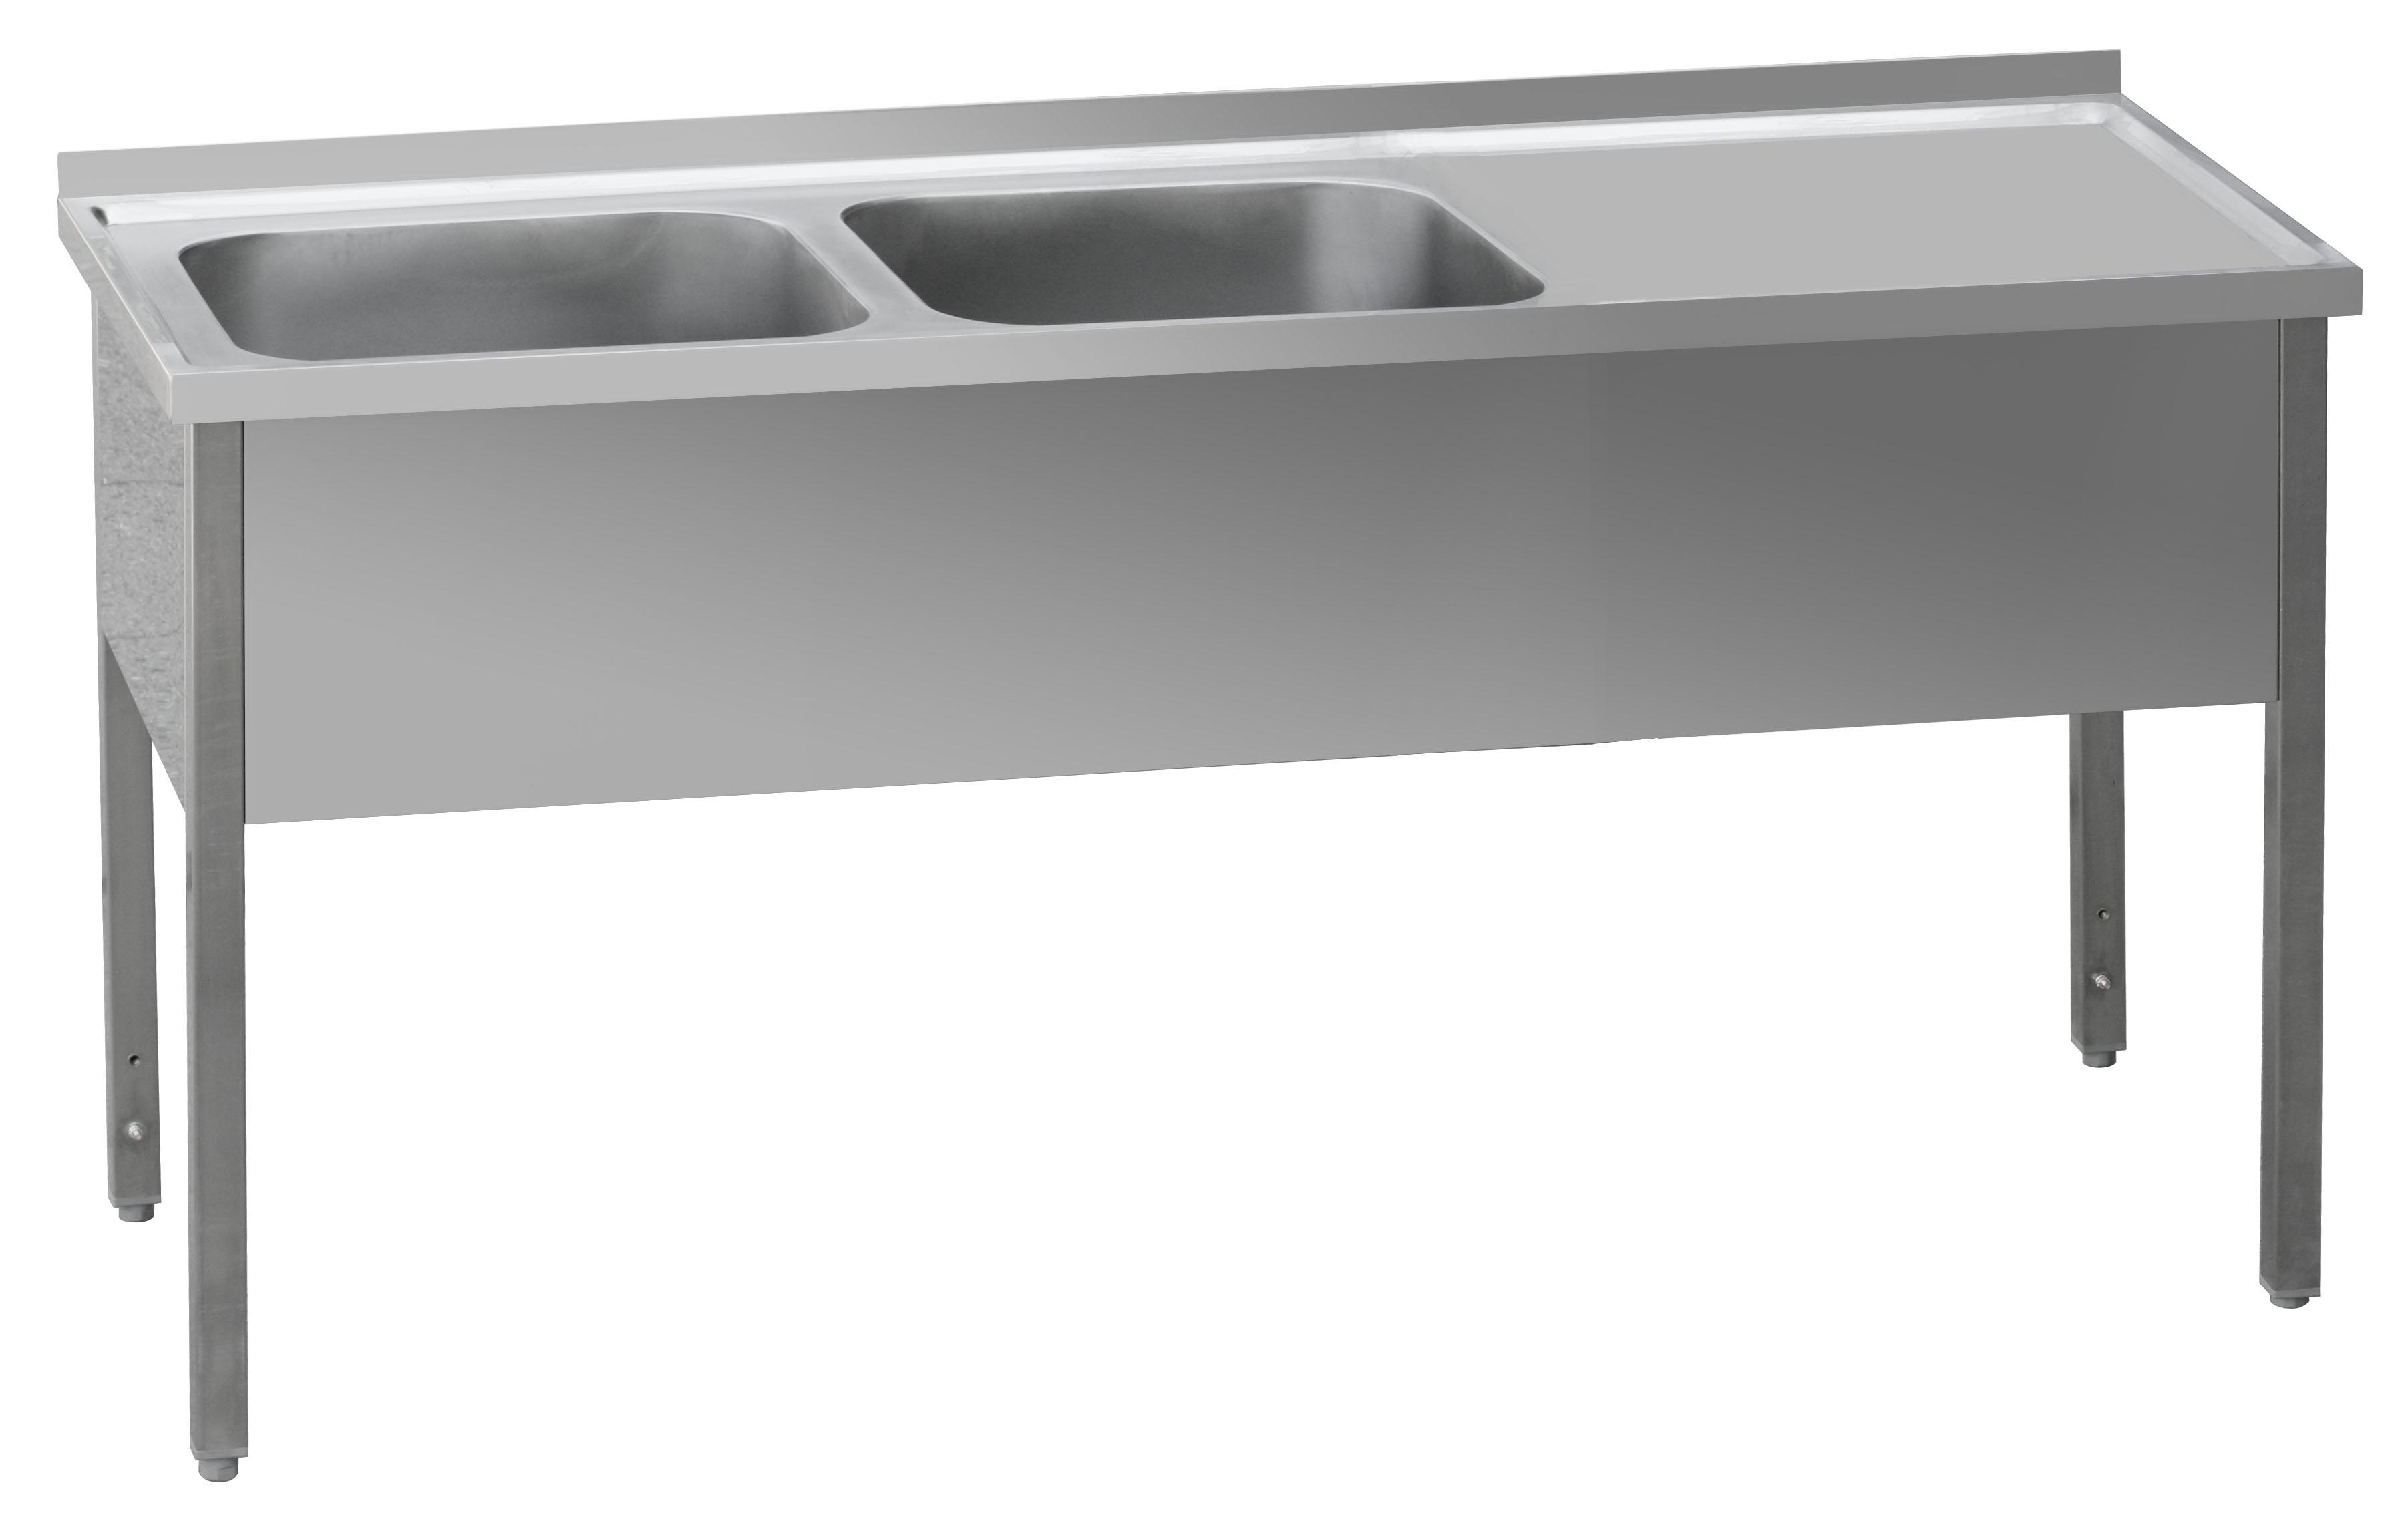 Stůl mycí dvoudřez MSDOP 190x70x90 REDFOX